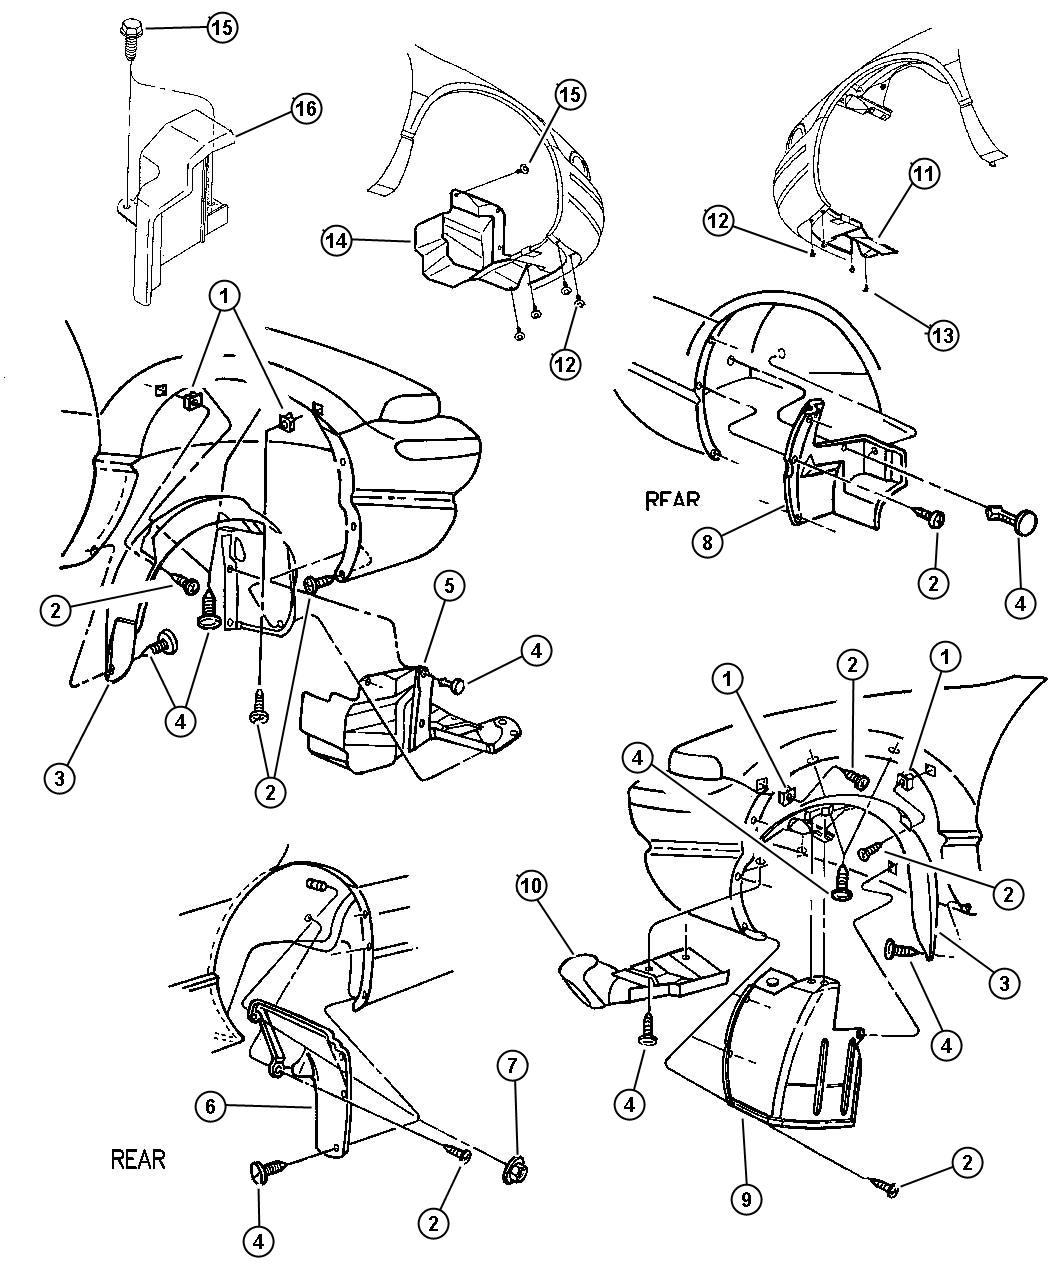 Dodge Stratus Shield. Alternator. Alternator noise, 2.4l 4